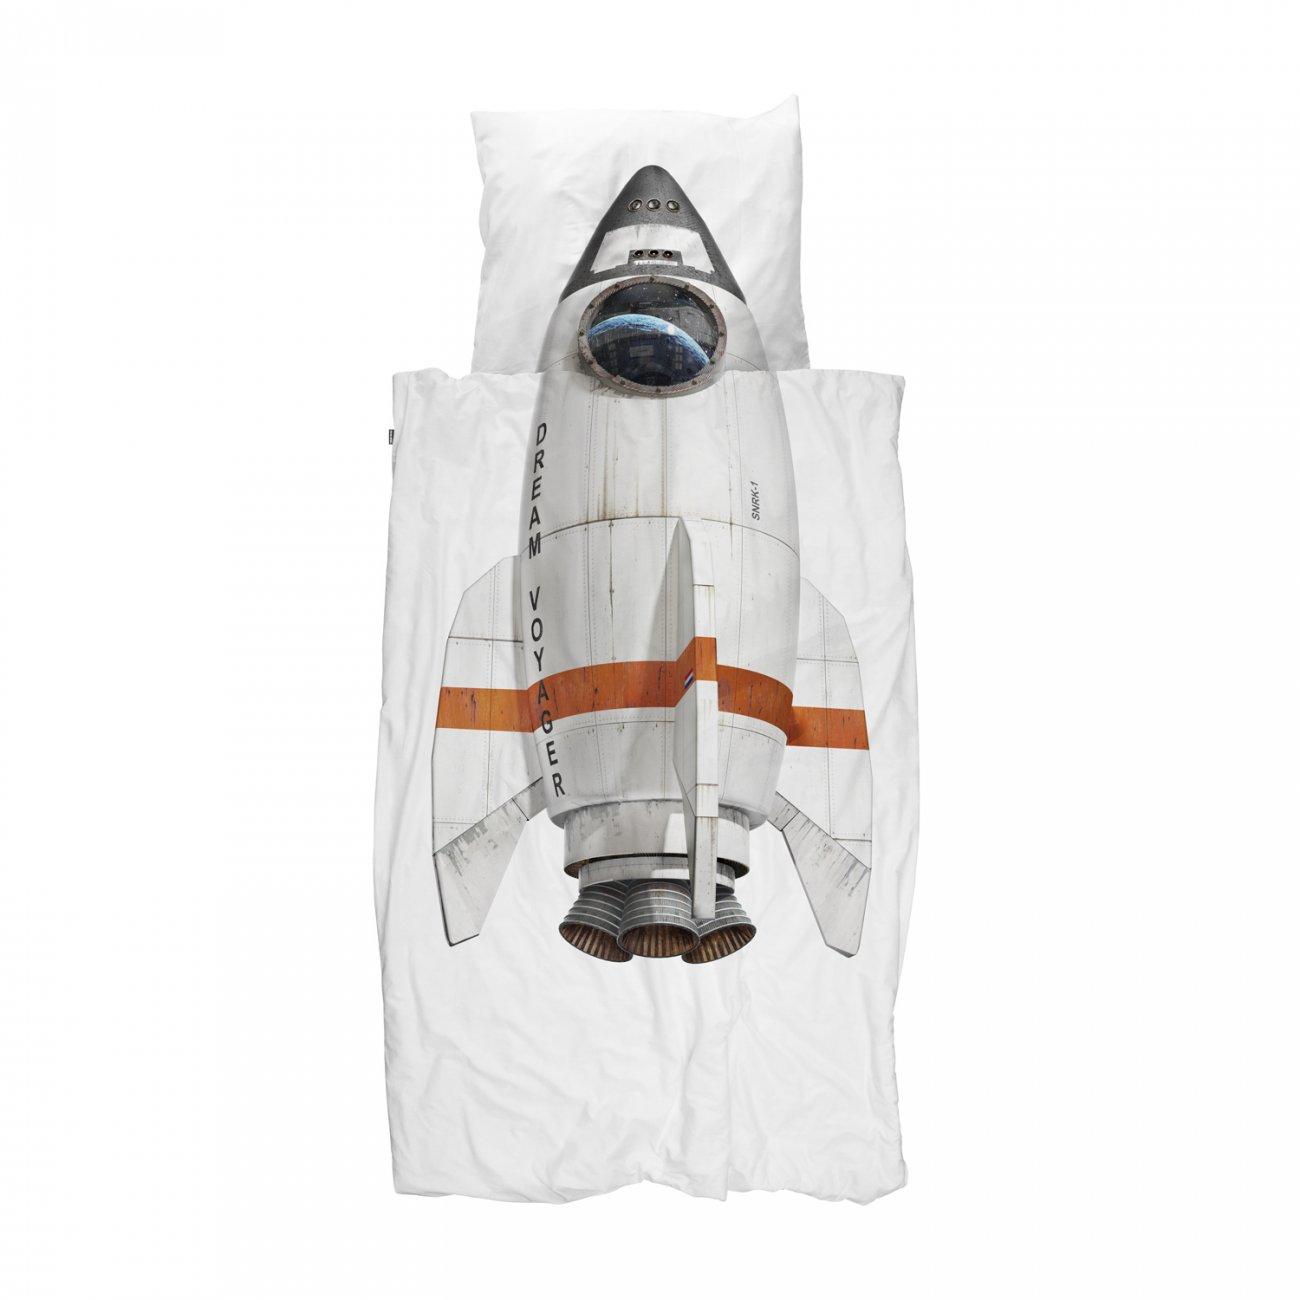 Snurk dekbedovertrek Rocket - 140x220